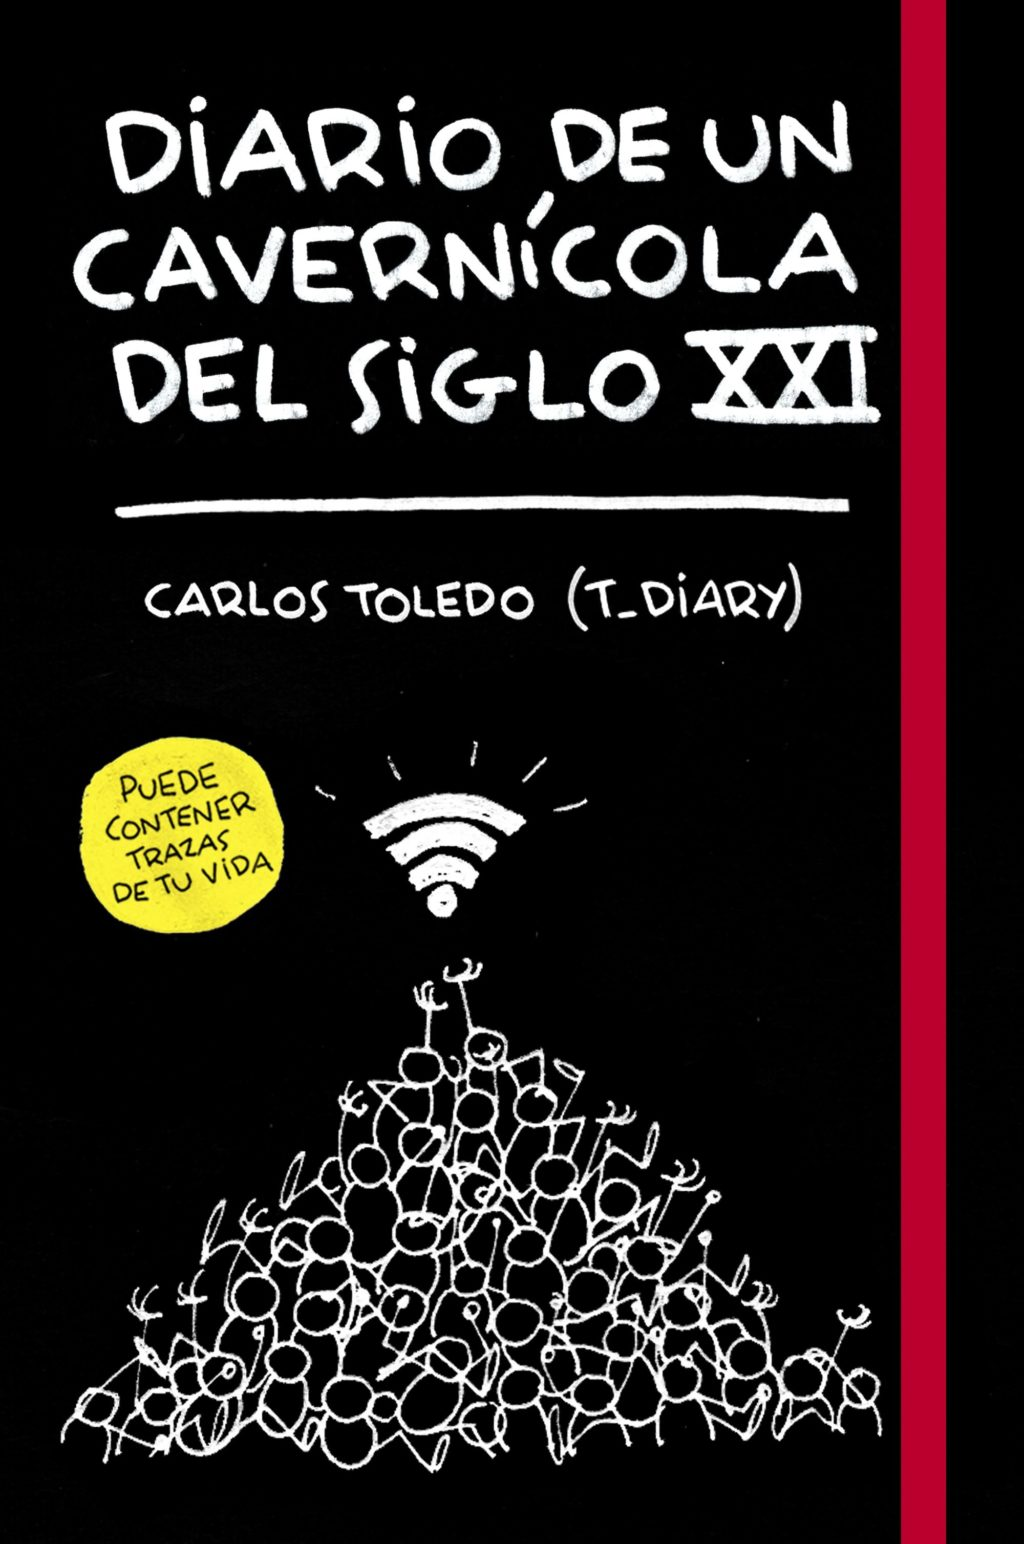 Diario de un cavernicola del siglo XXI